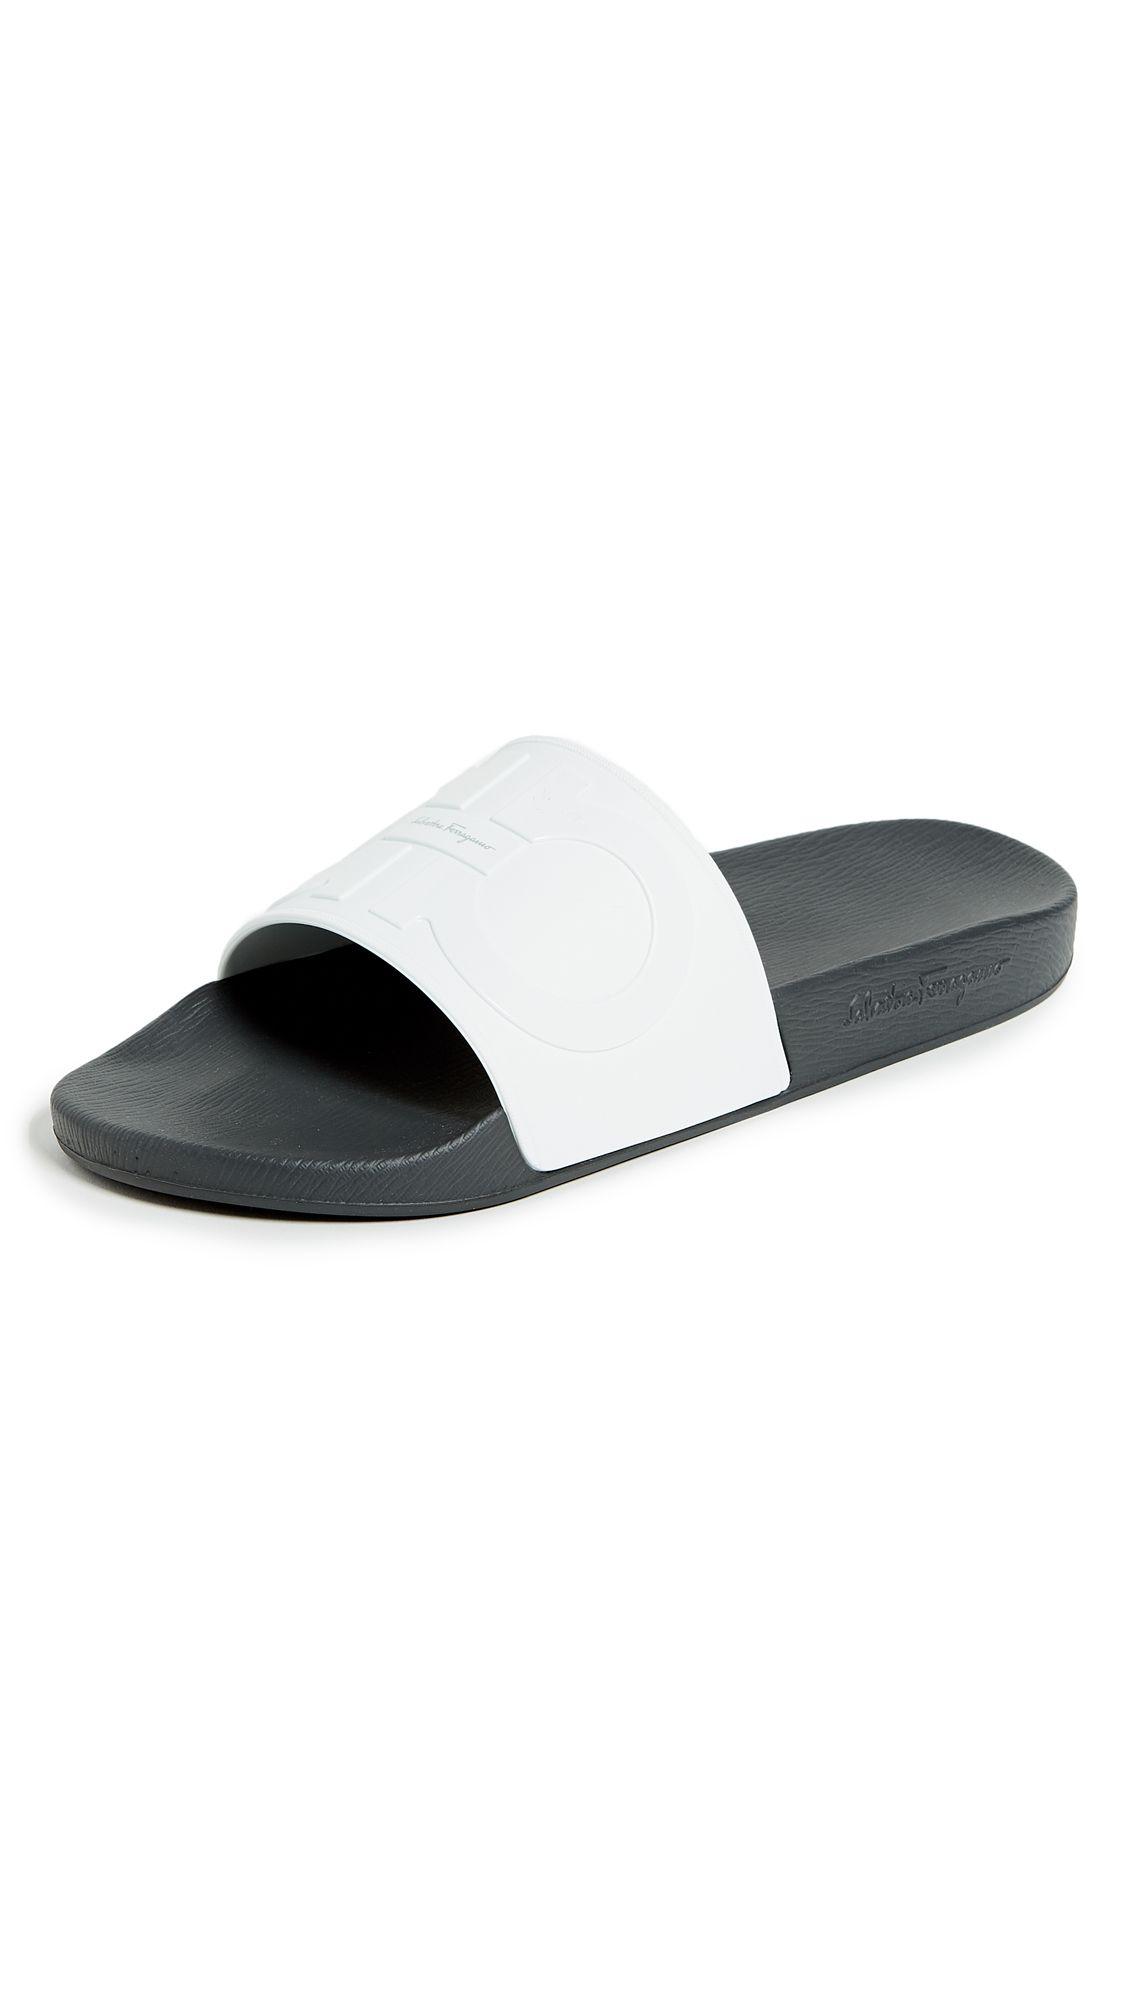 923662300ab SALVATORE FERRAGAMO GROOVE 2 SLIDE SANDALS.  salvatoreferragamo  shoes